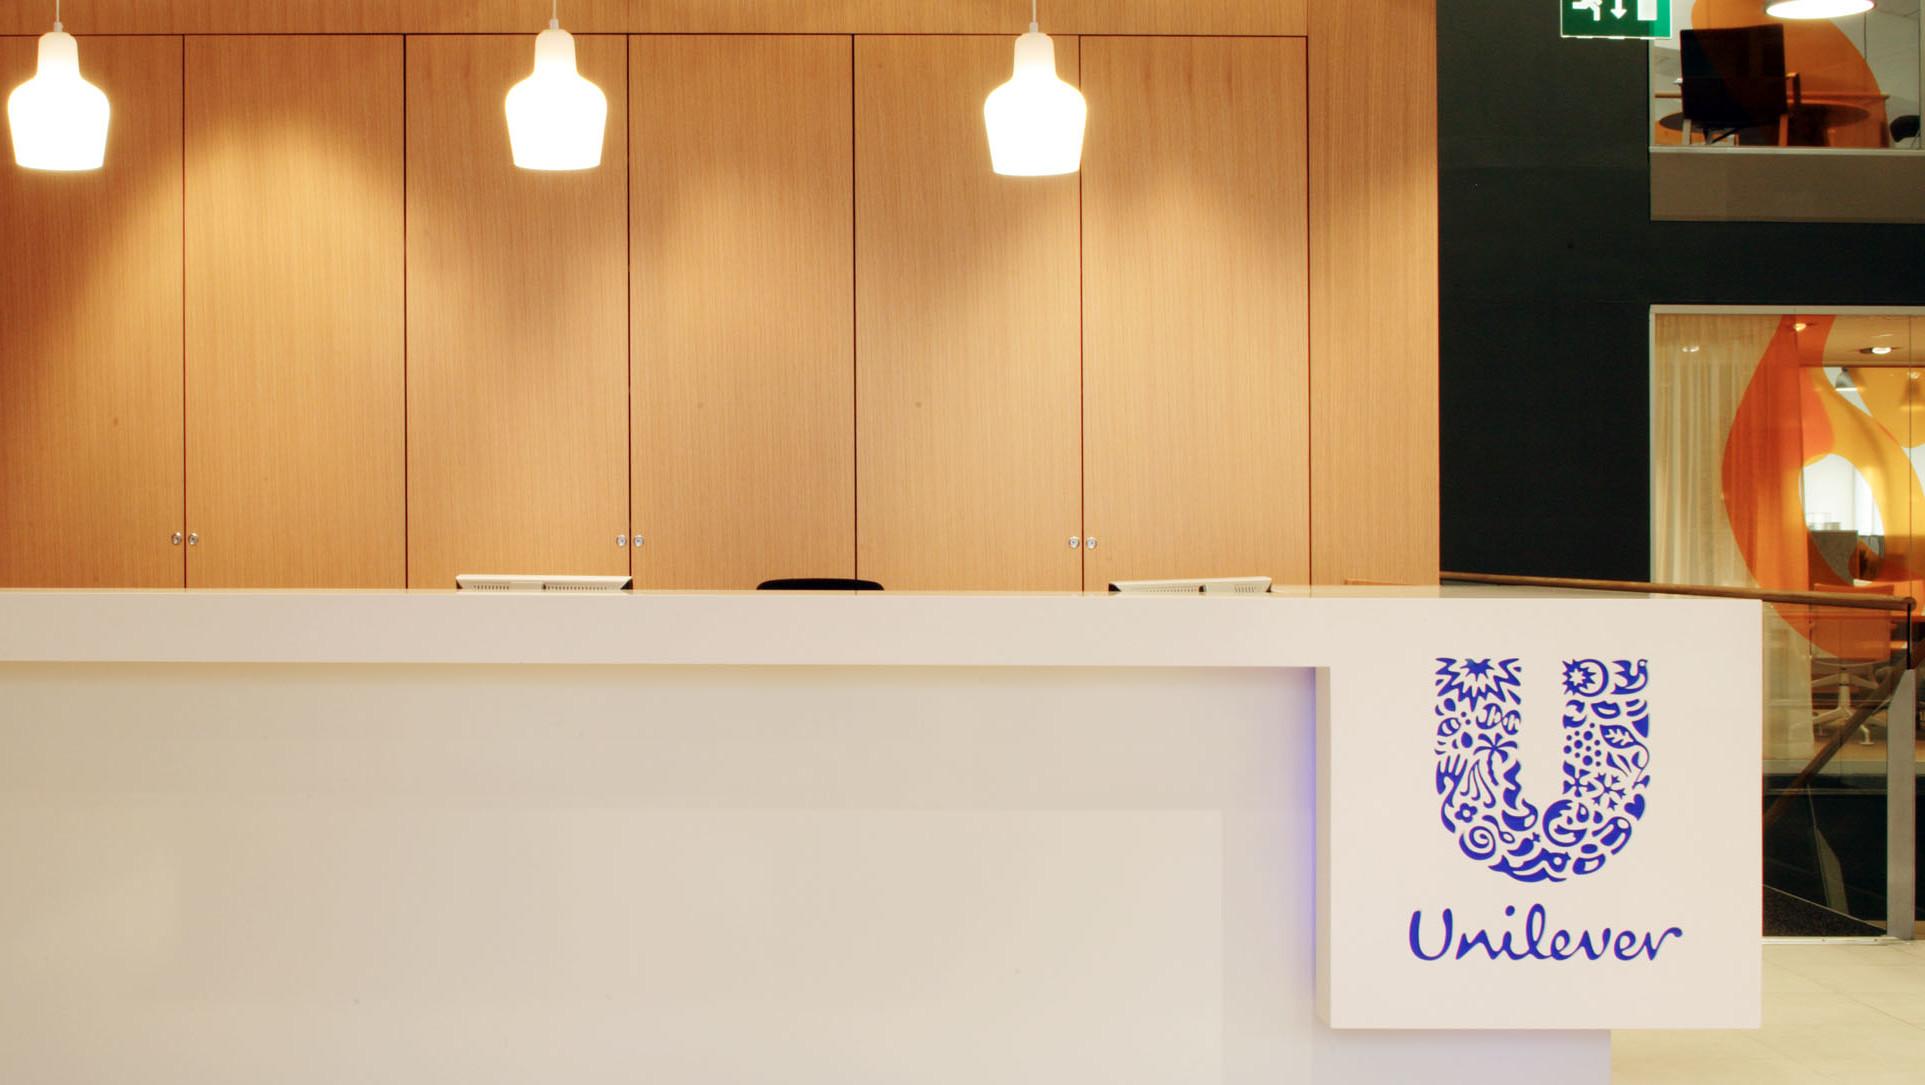 Unilever-Finland-Helsinki-GI-Project-2